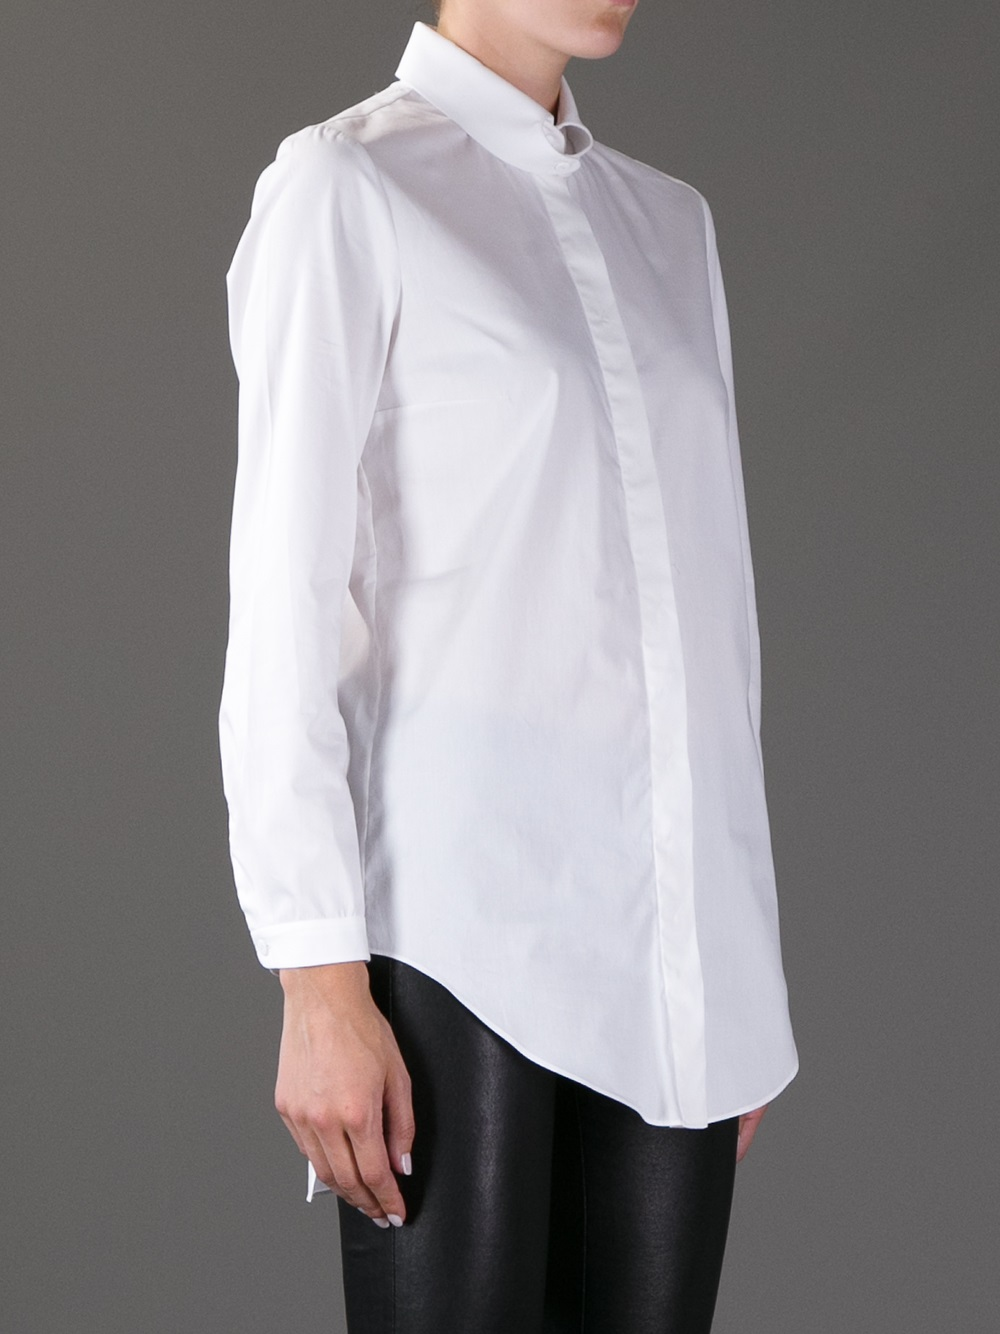 Carven white dress collar.